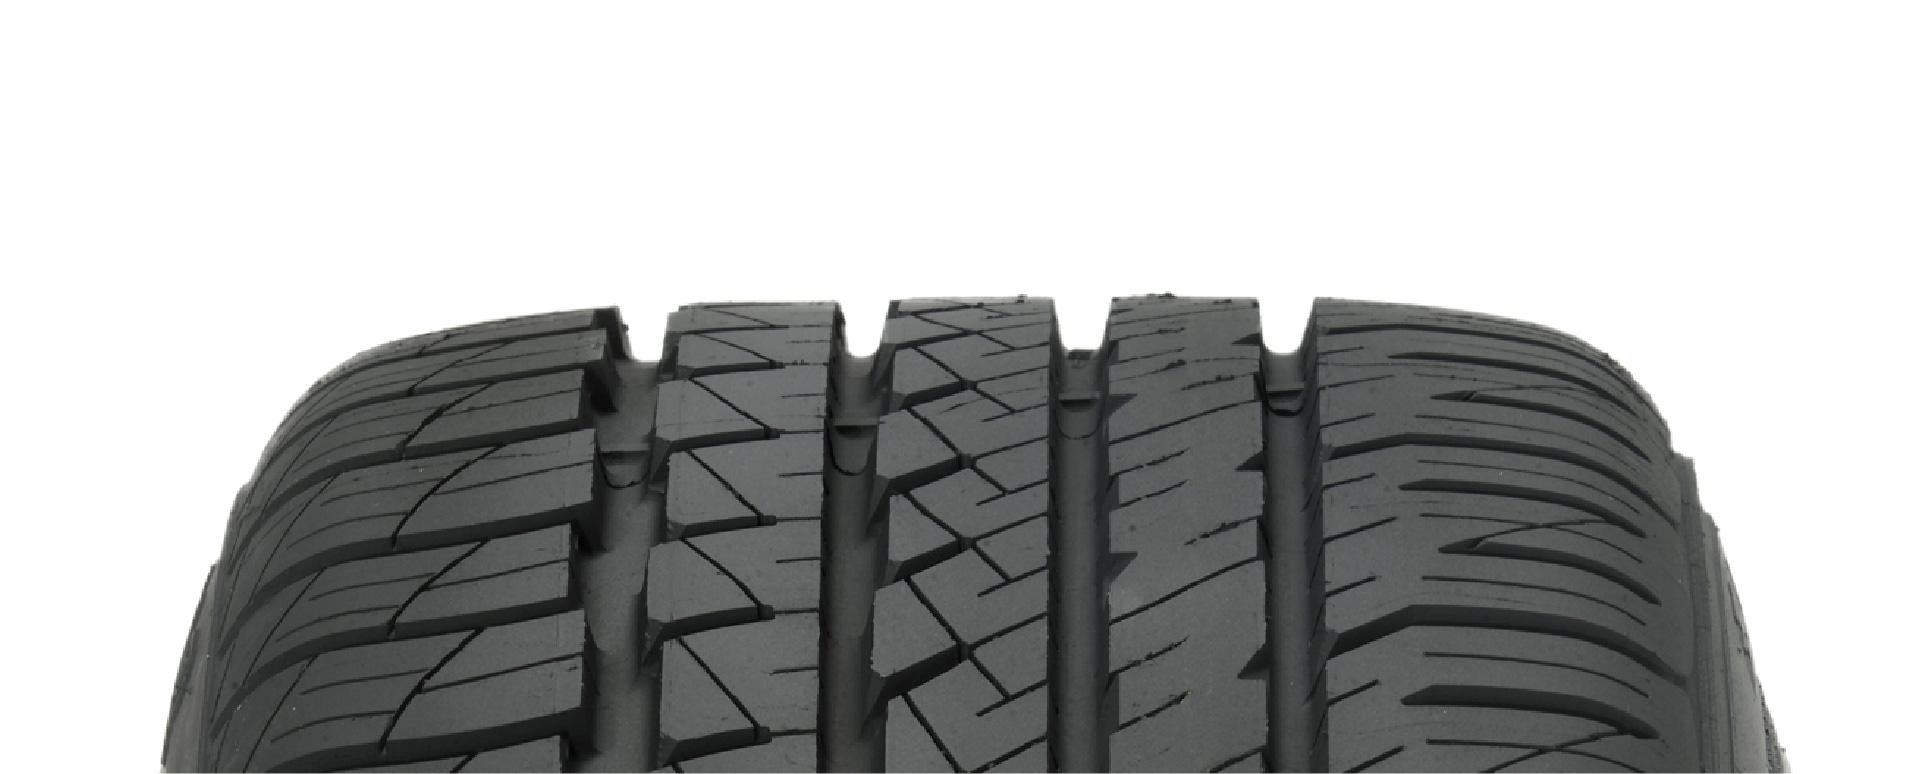 getTREAD installs tires you already have